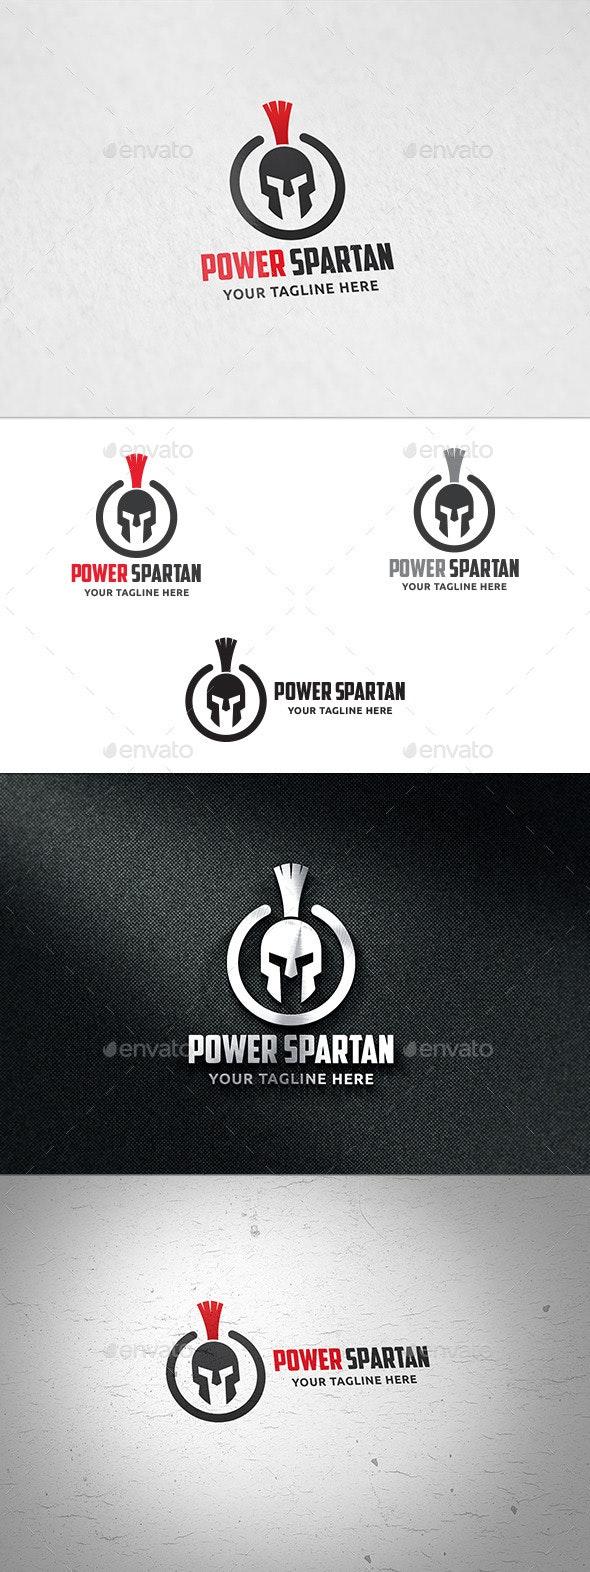 Power Spartan - Logo Template - Symbols Logo Templates